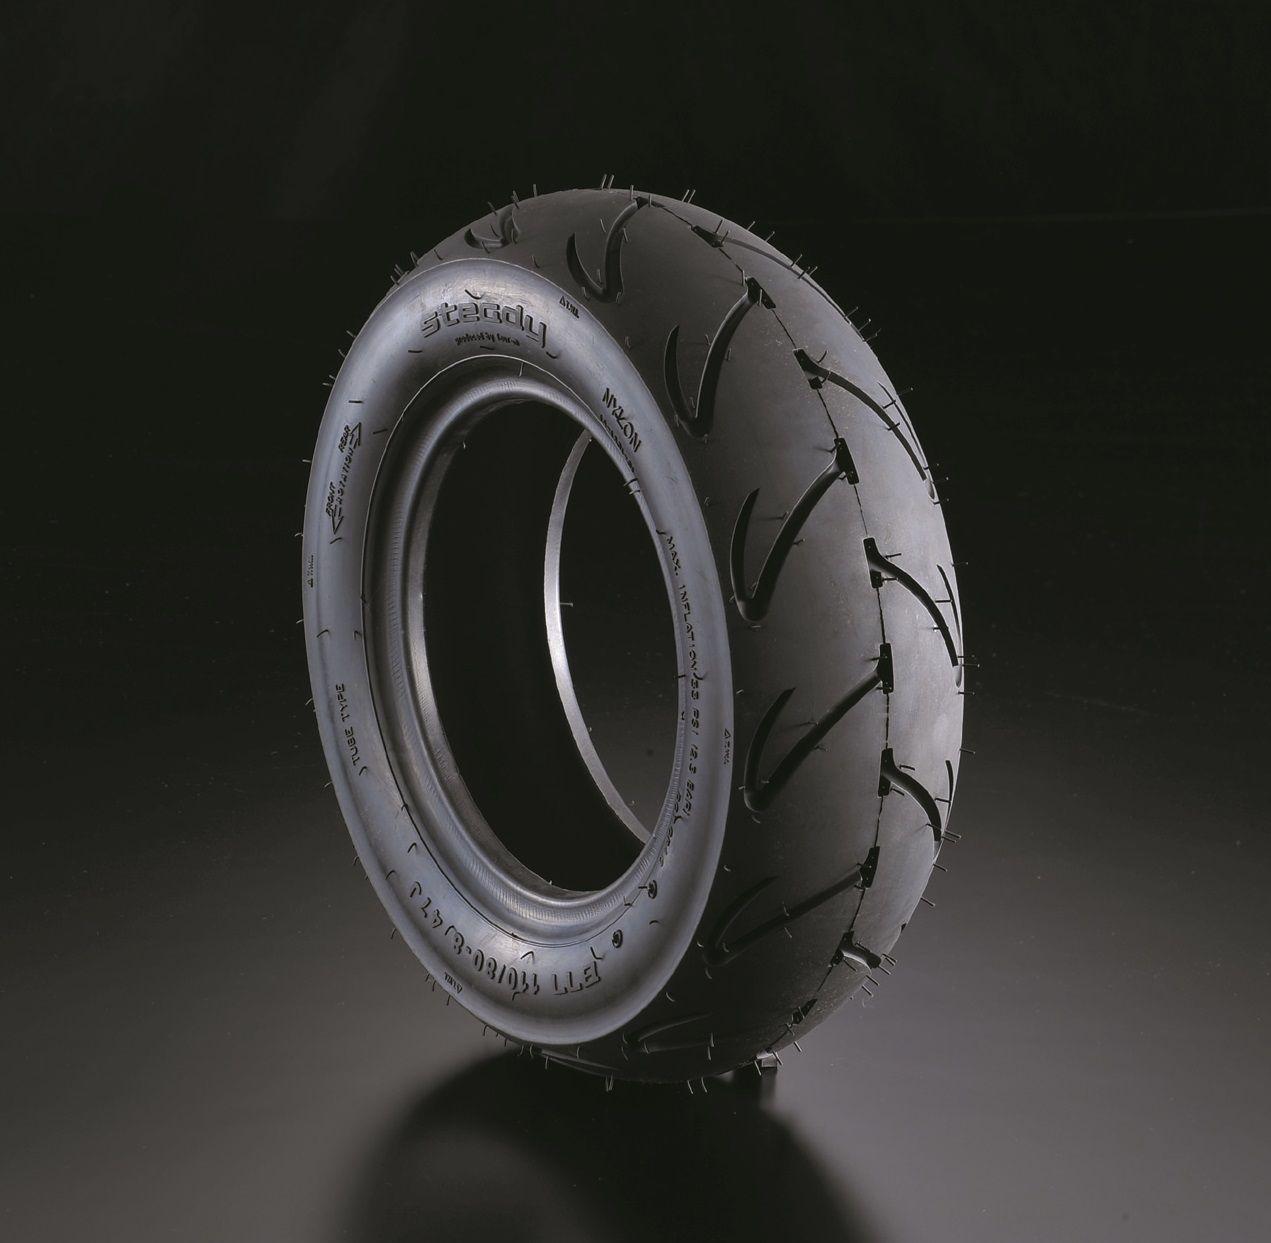 G-Craft steady B - 77 (Banana Tire) [110 / 80-8] Steady Tire